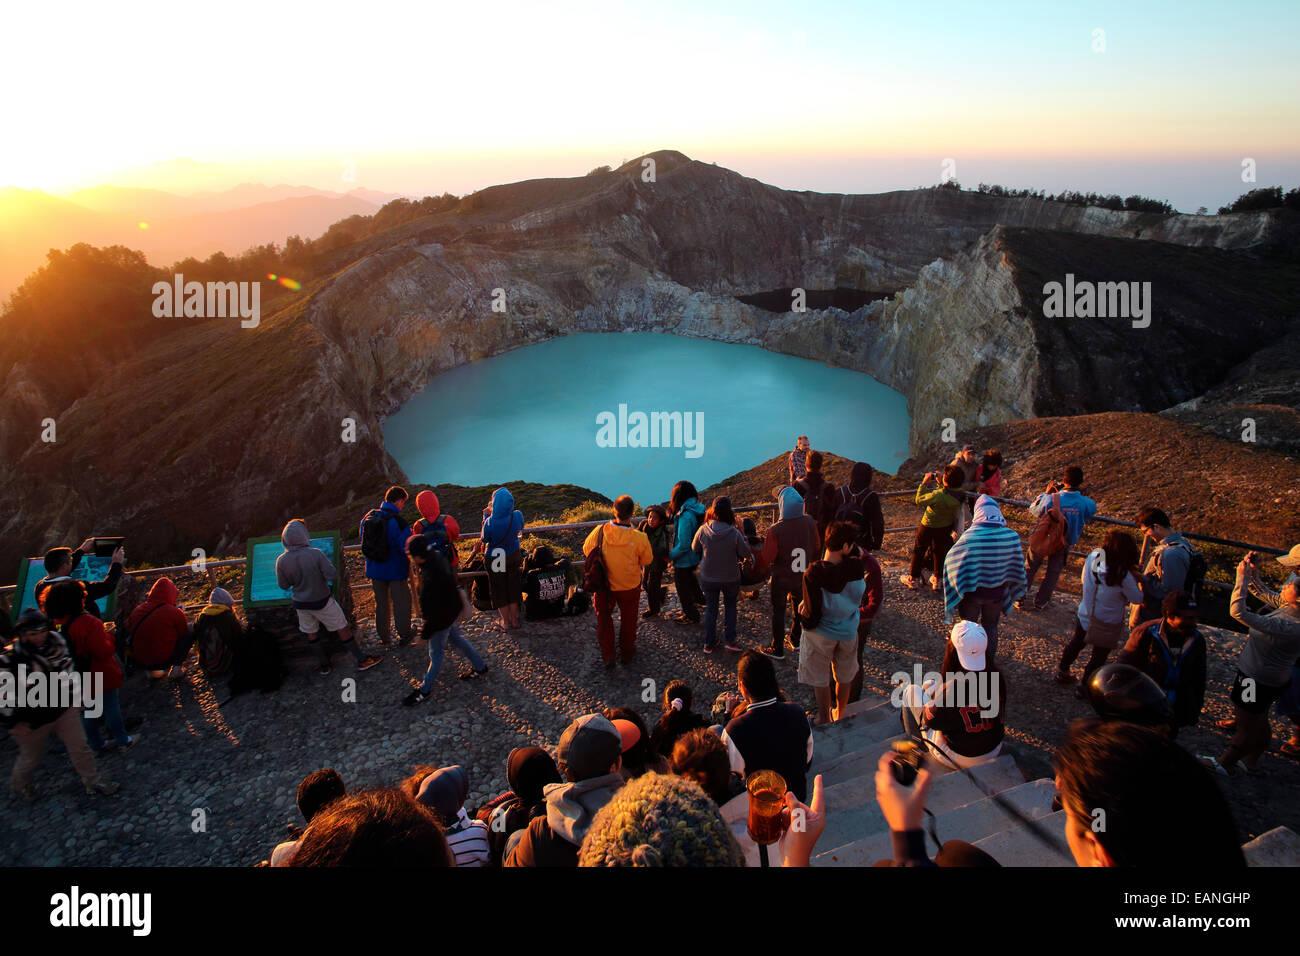 Crowd Watching Sunrise At Kelimutu Volcano In Flores